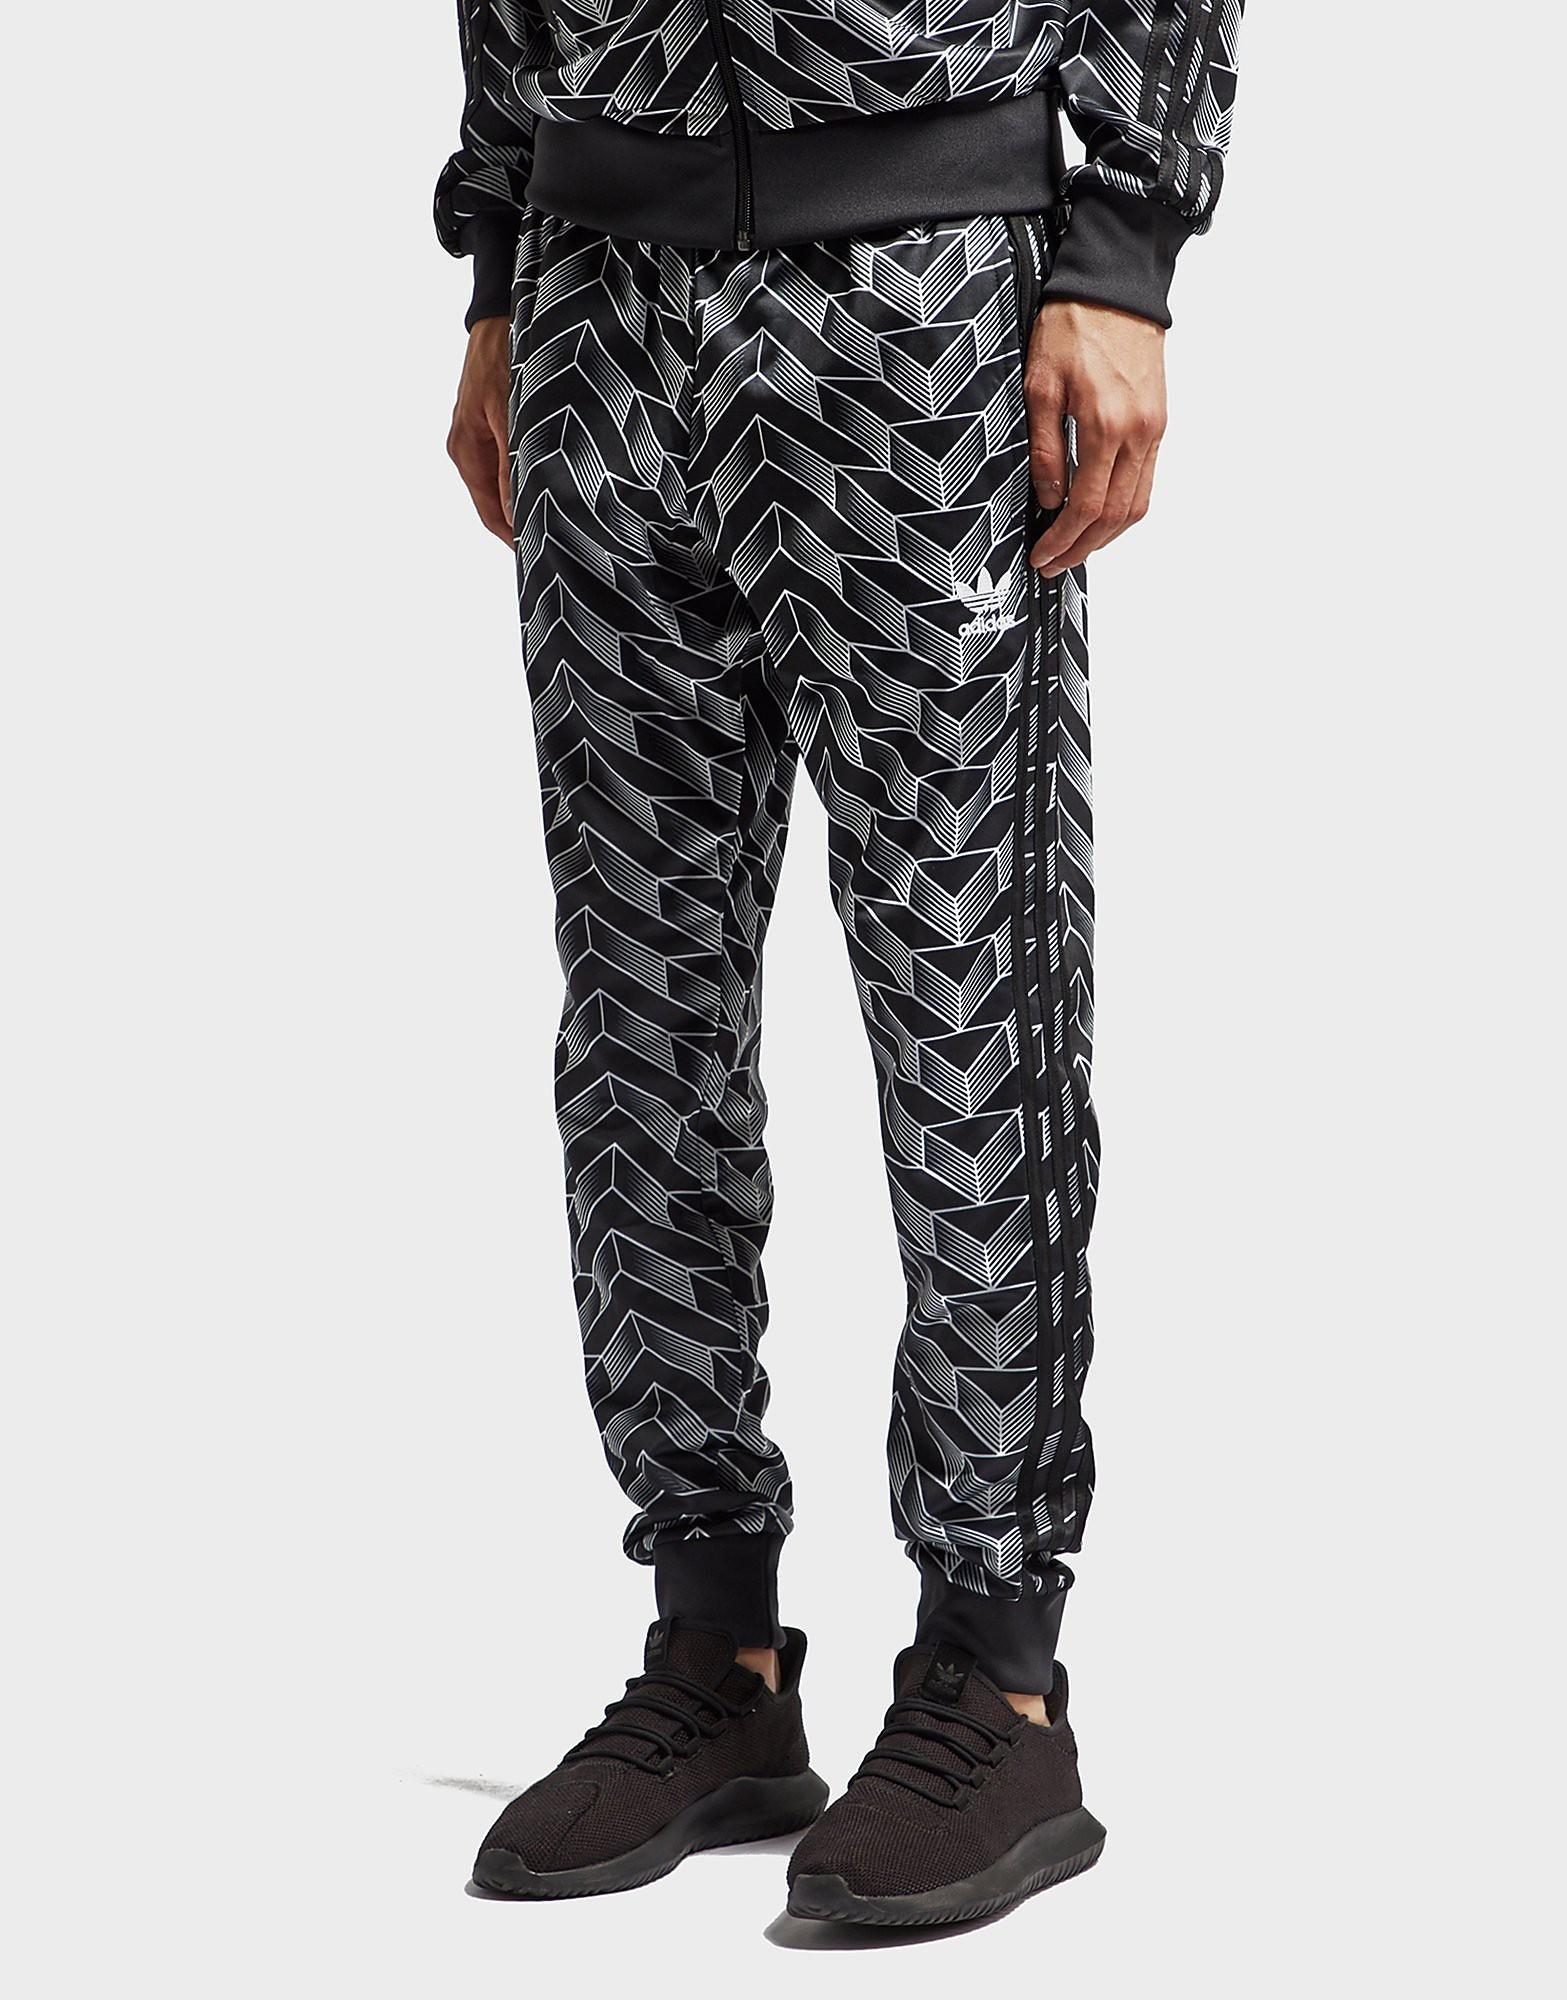 adidas Originals Soccer Stripe Track Pants